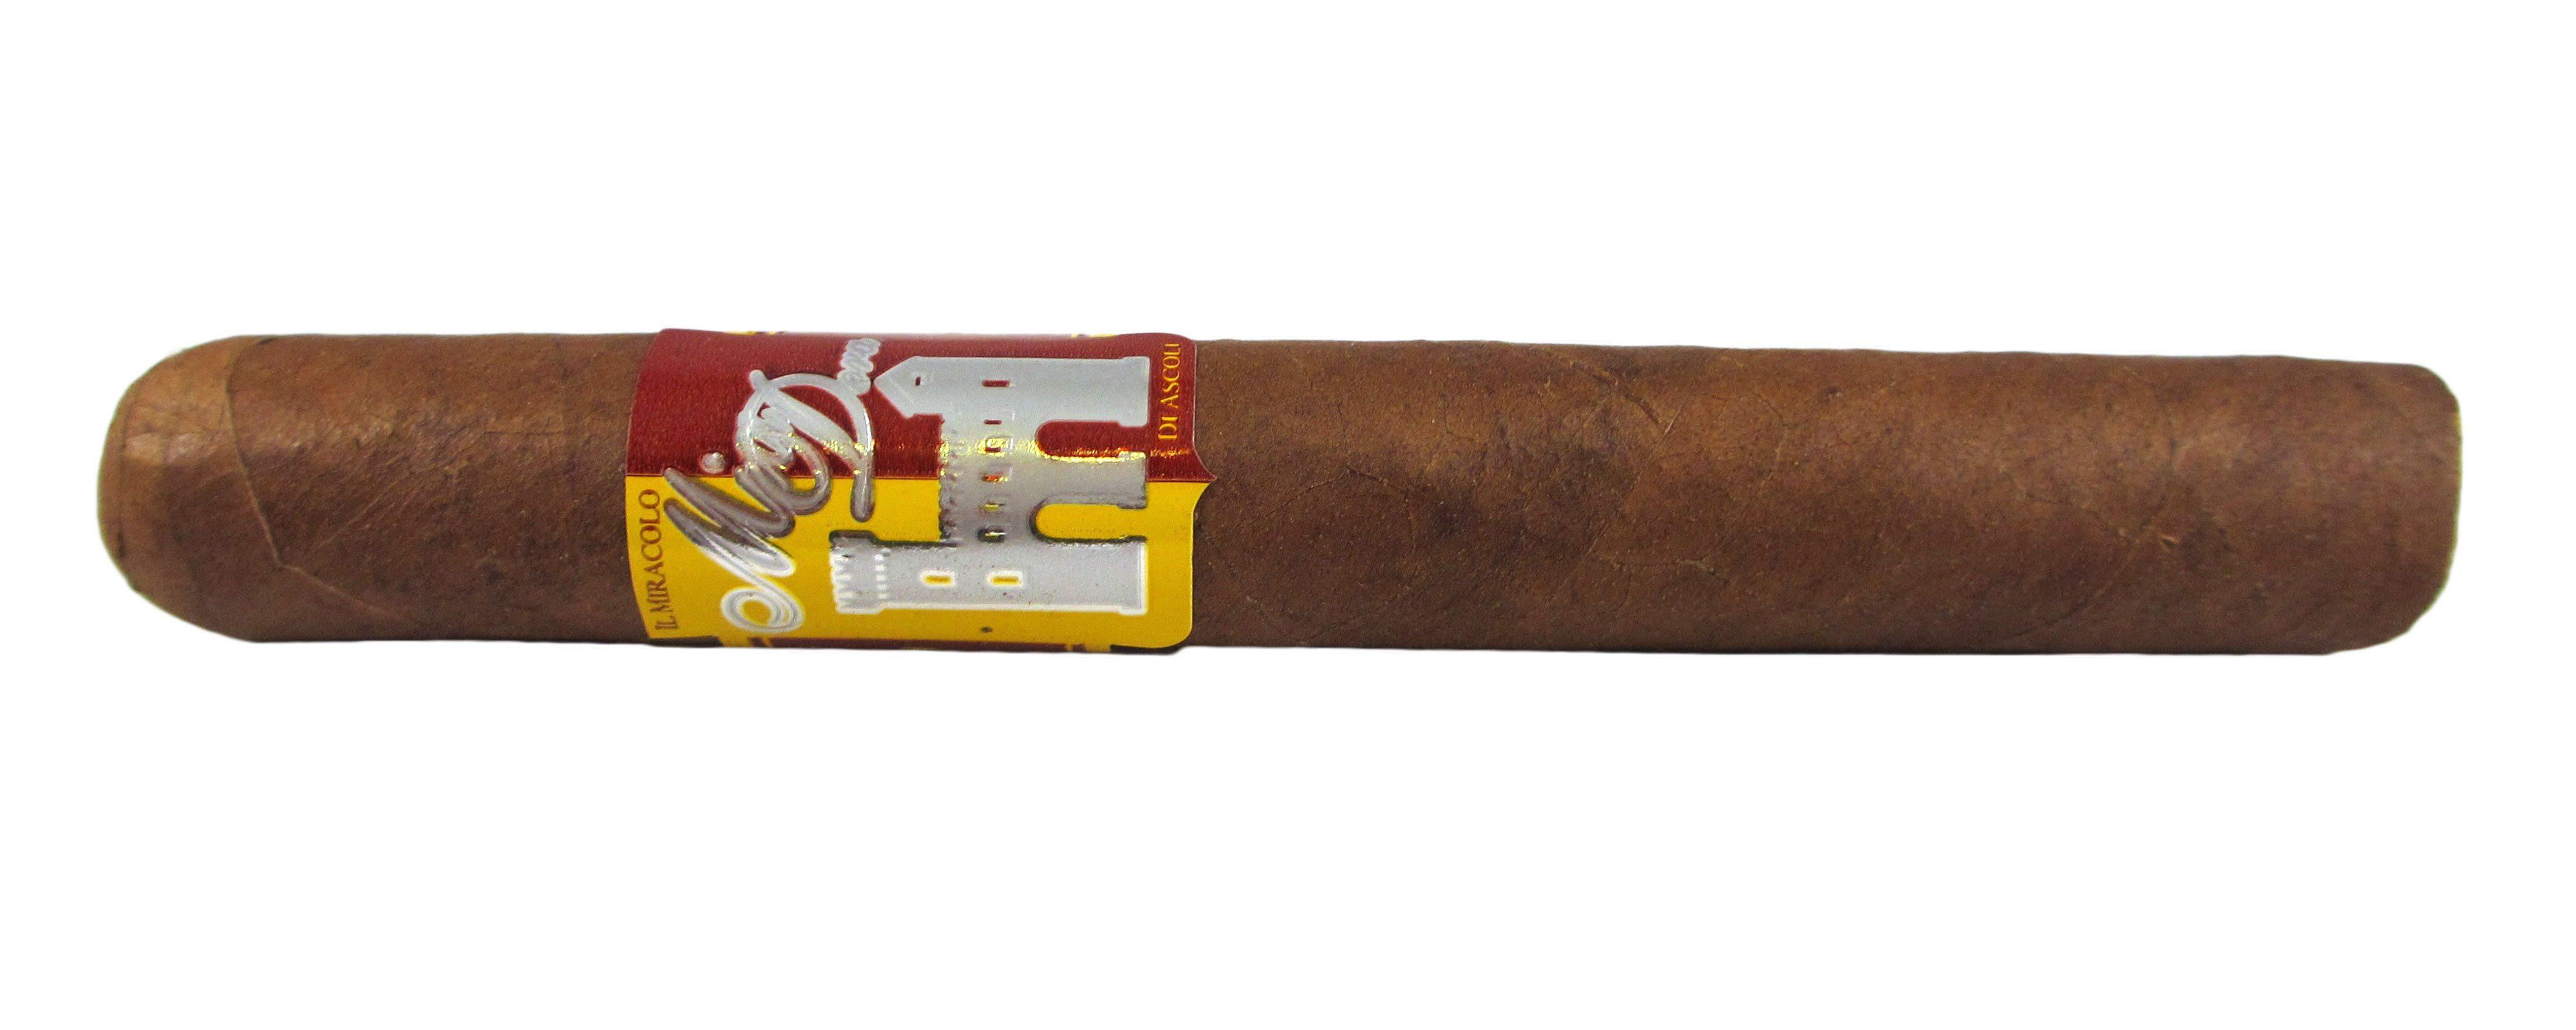 Blind Cigar Review: Emilio | Mia Dora Coronita